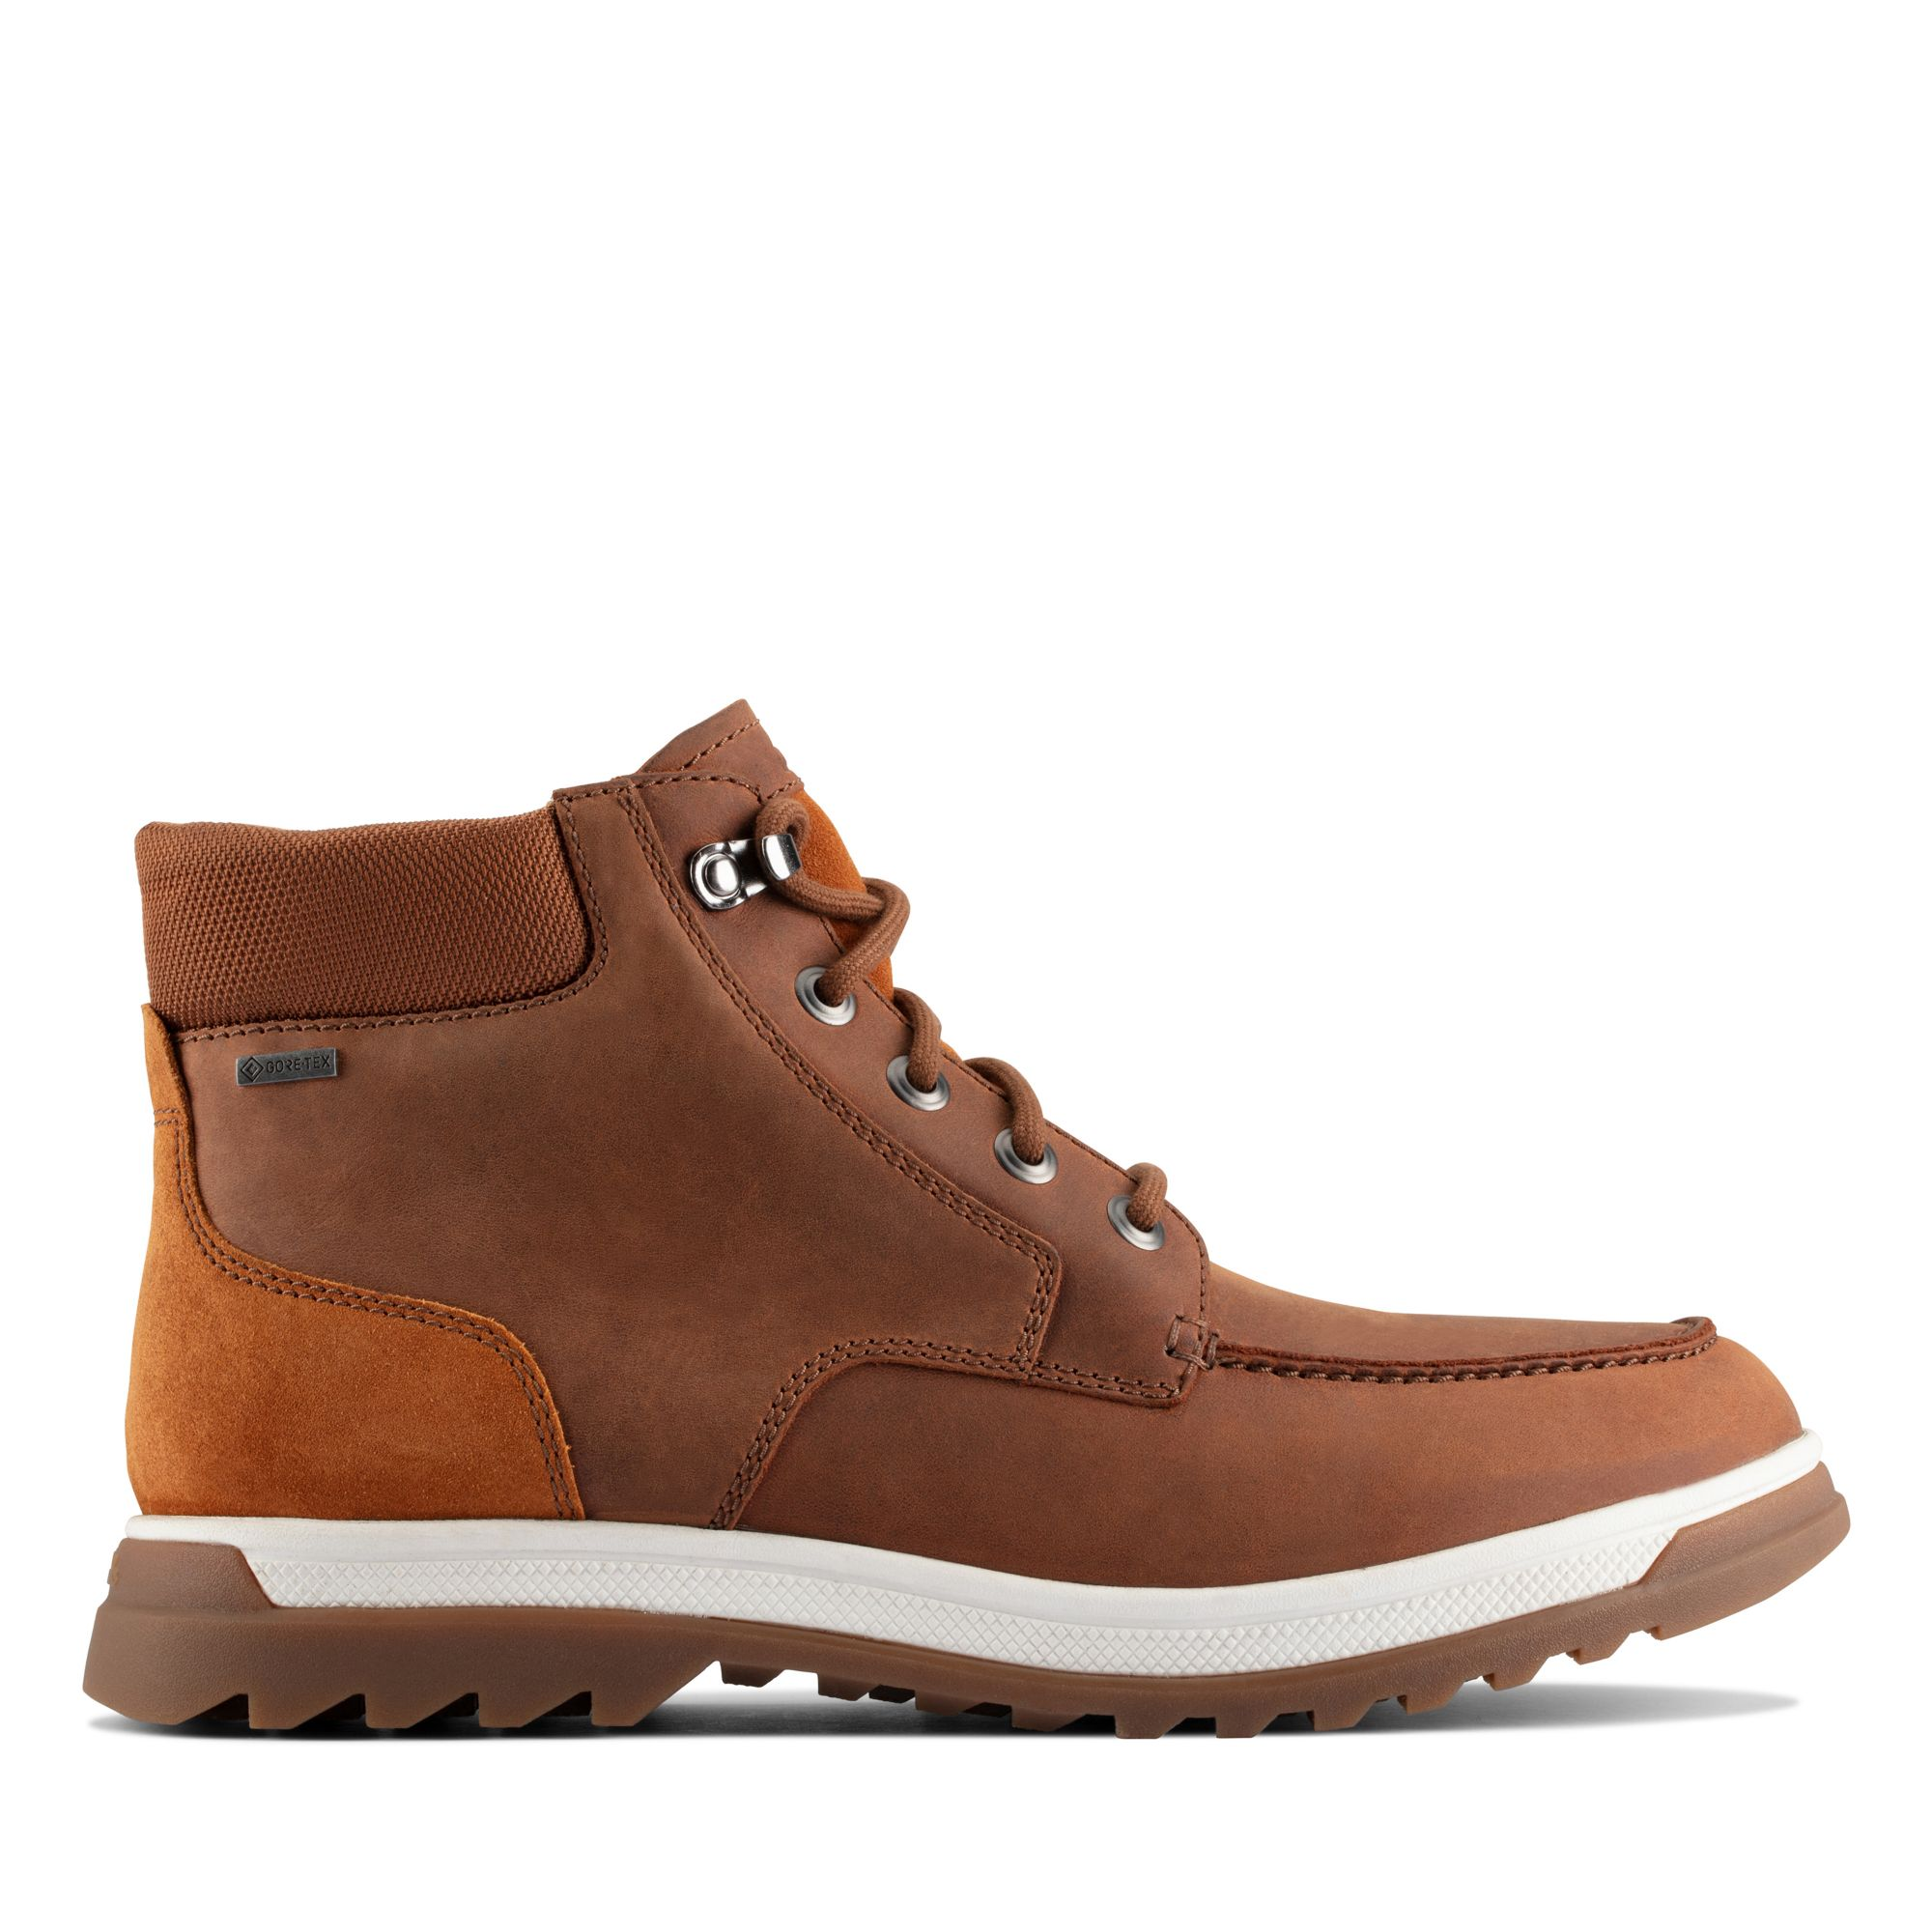 Clarks Ripway Hi GTX – Leather